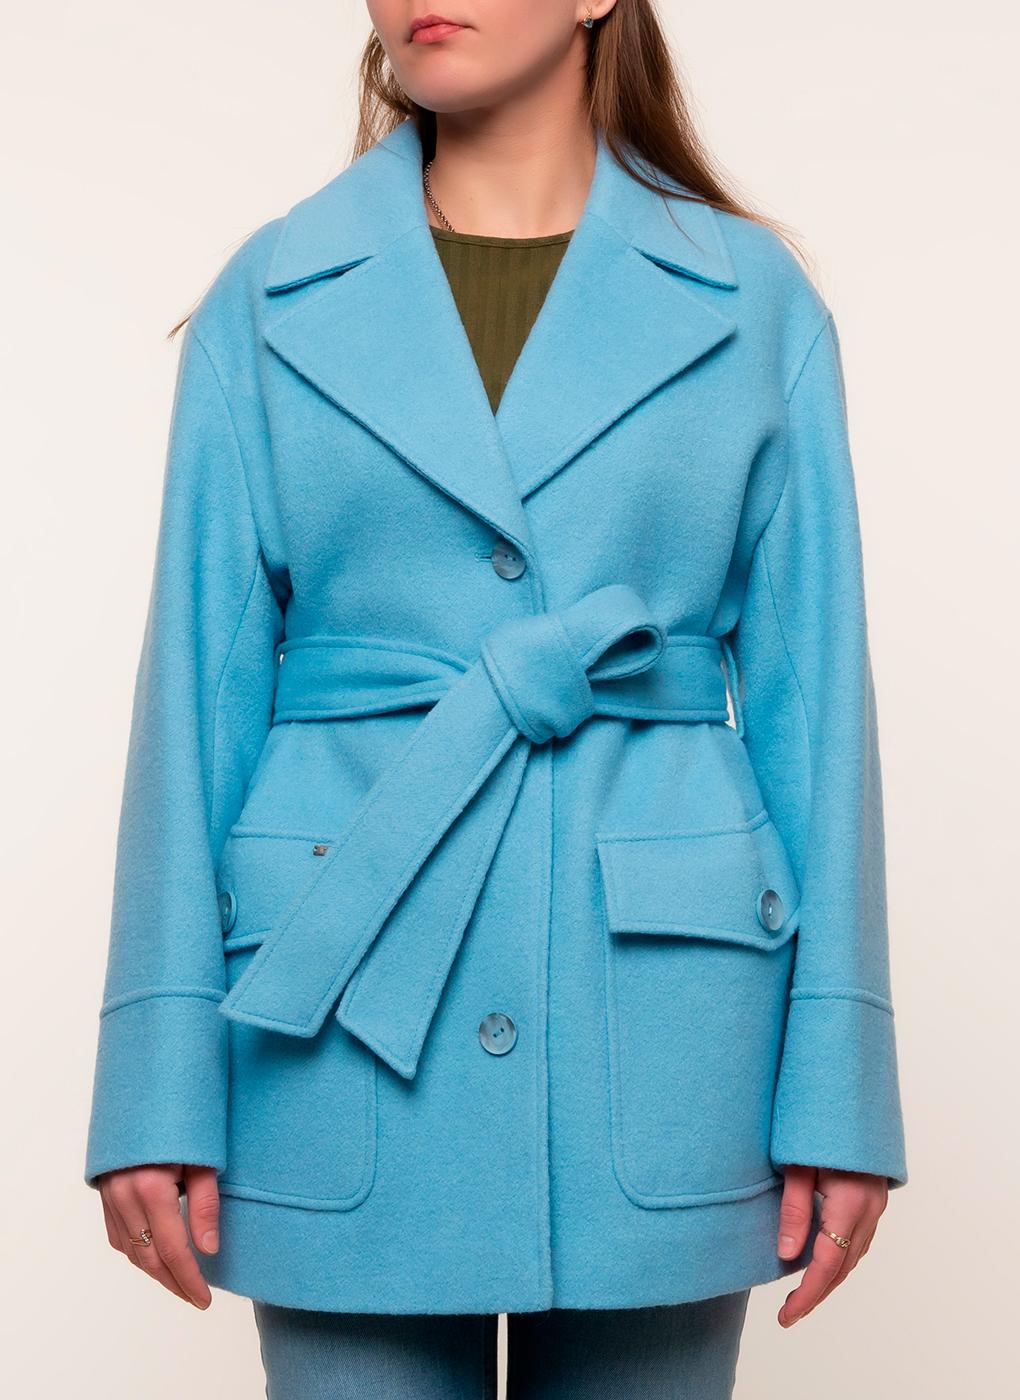 Пальто полушерстяное 110, idekka фото